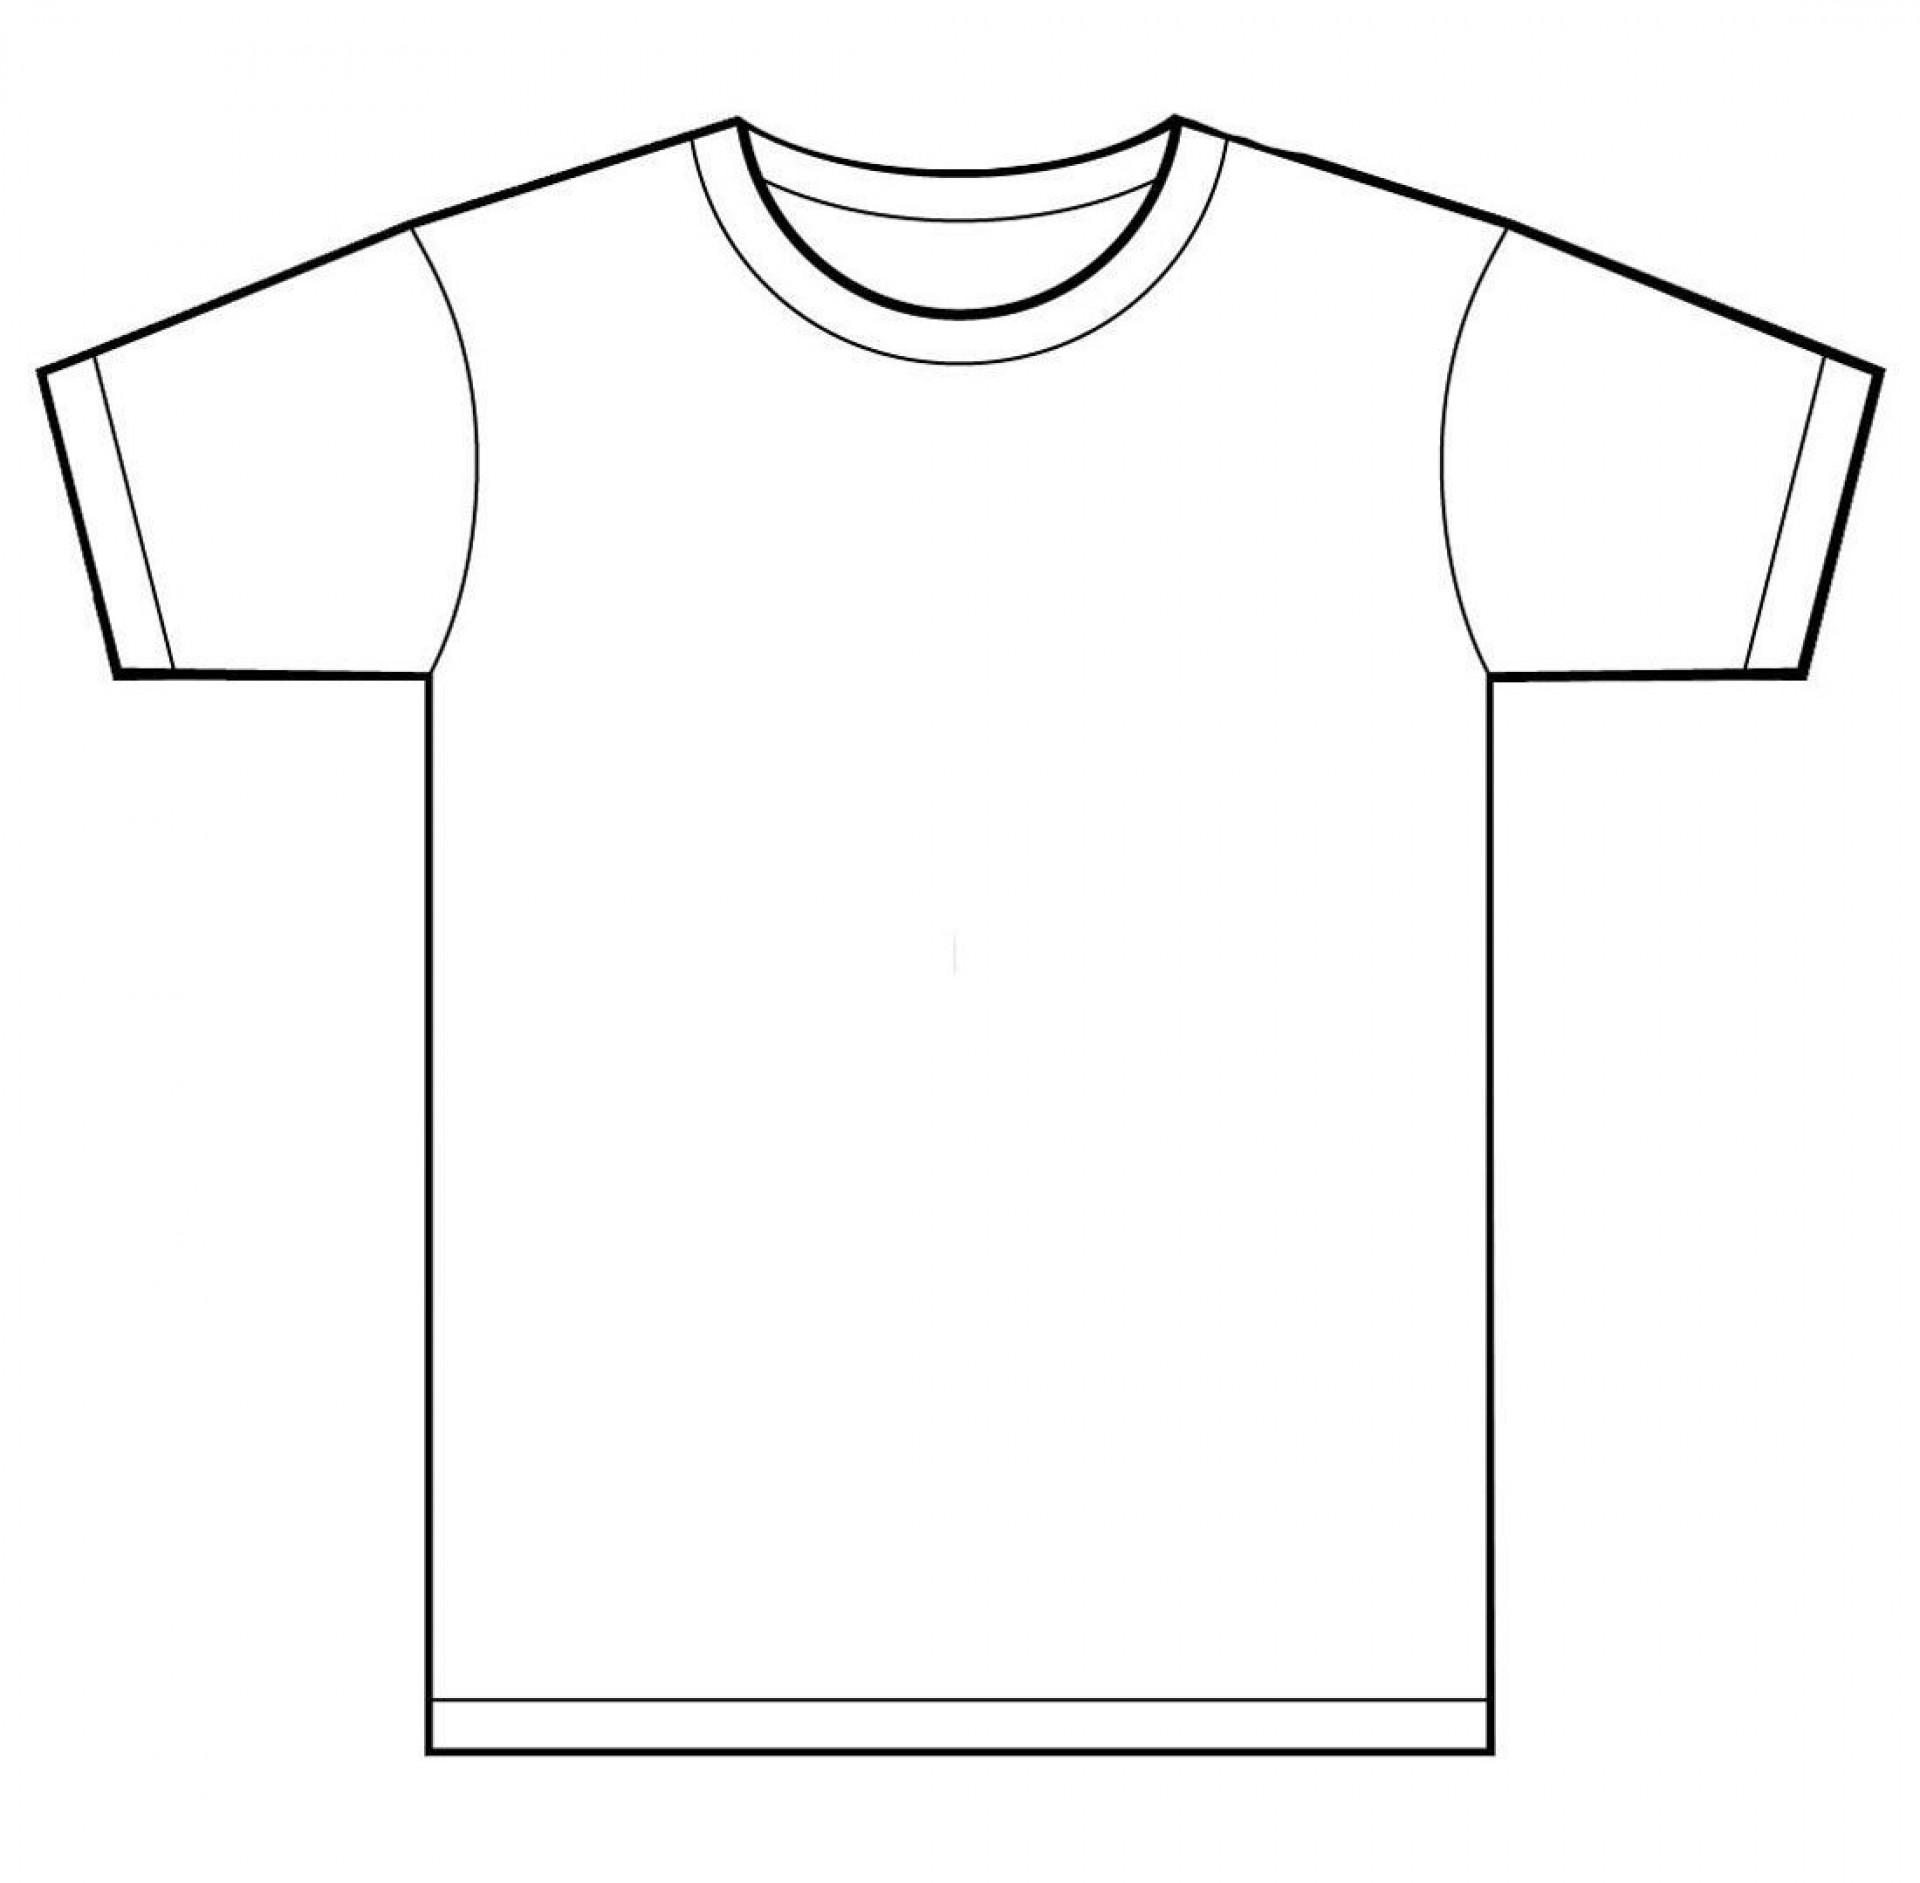 000 Impressive T Shirt Design Template Ai Example  Tee1920